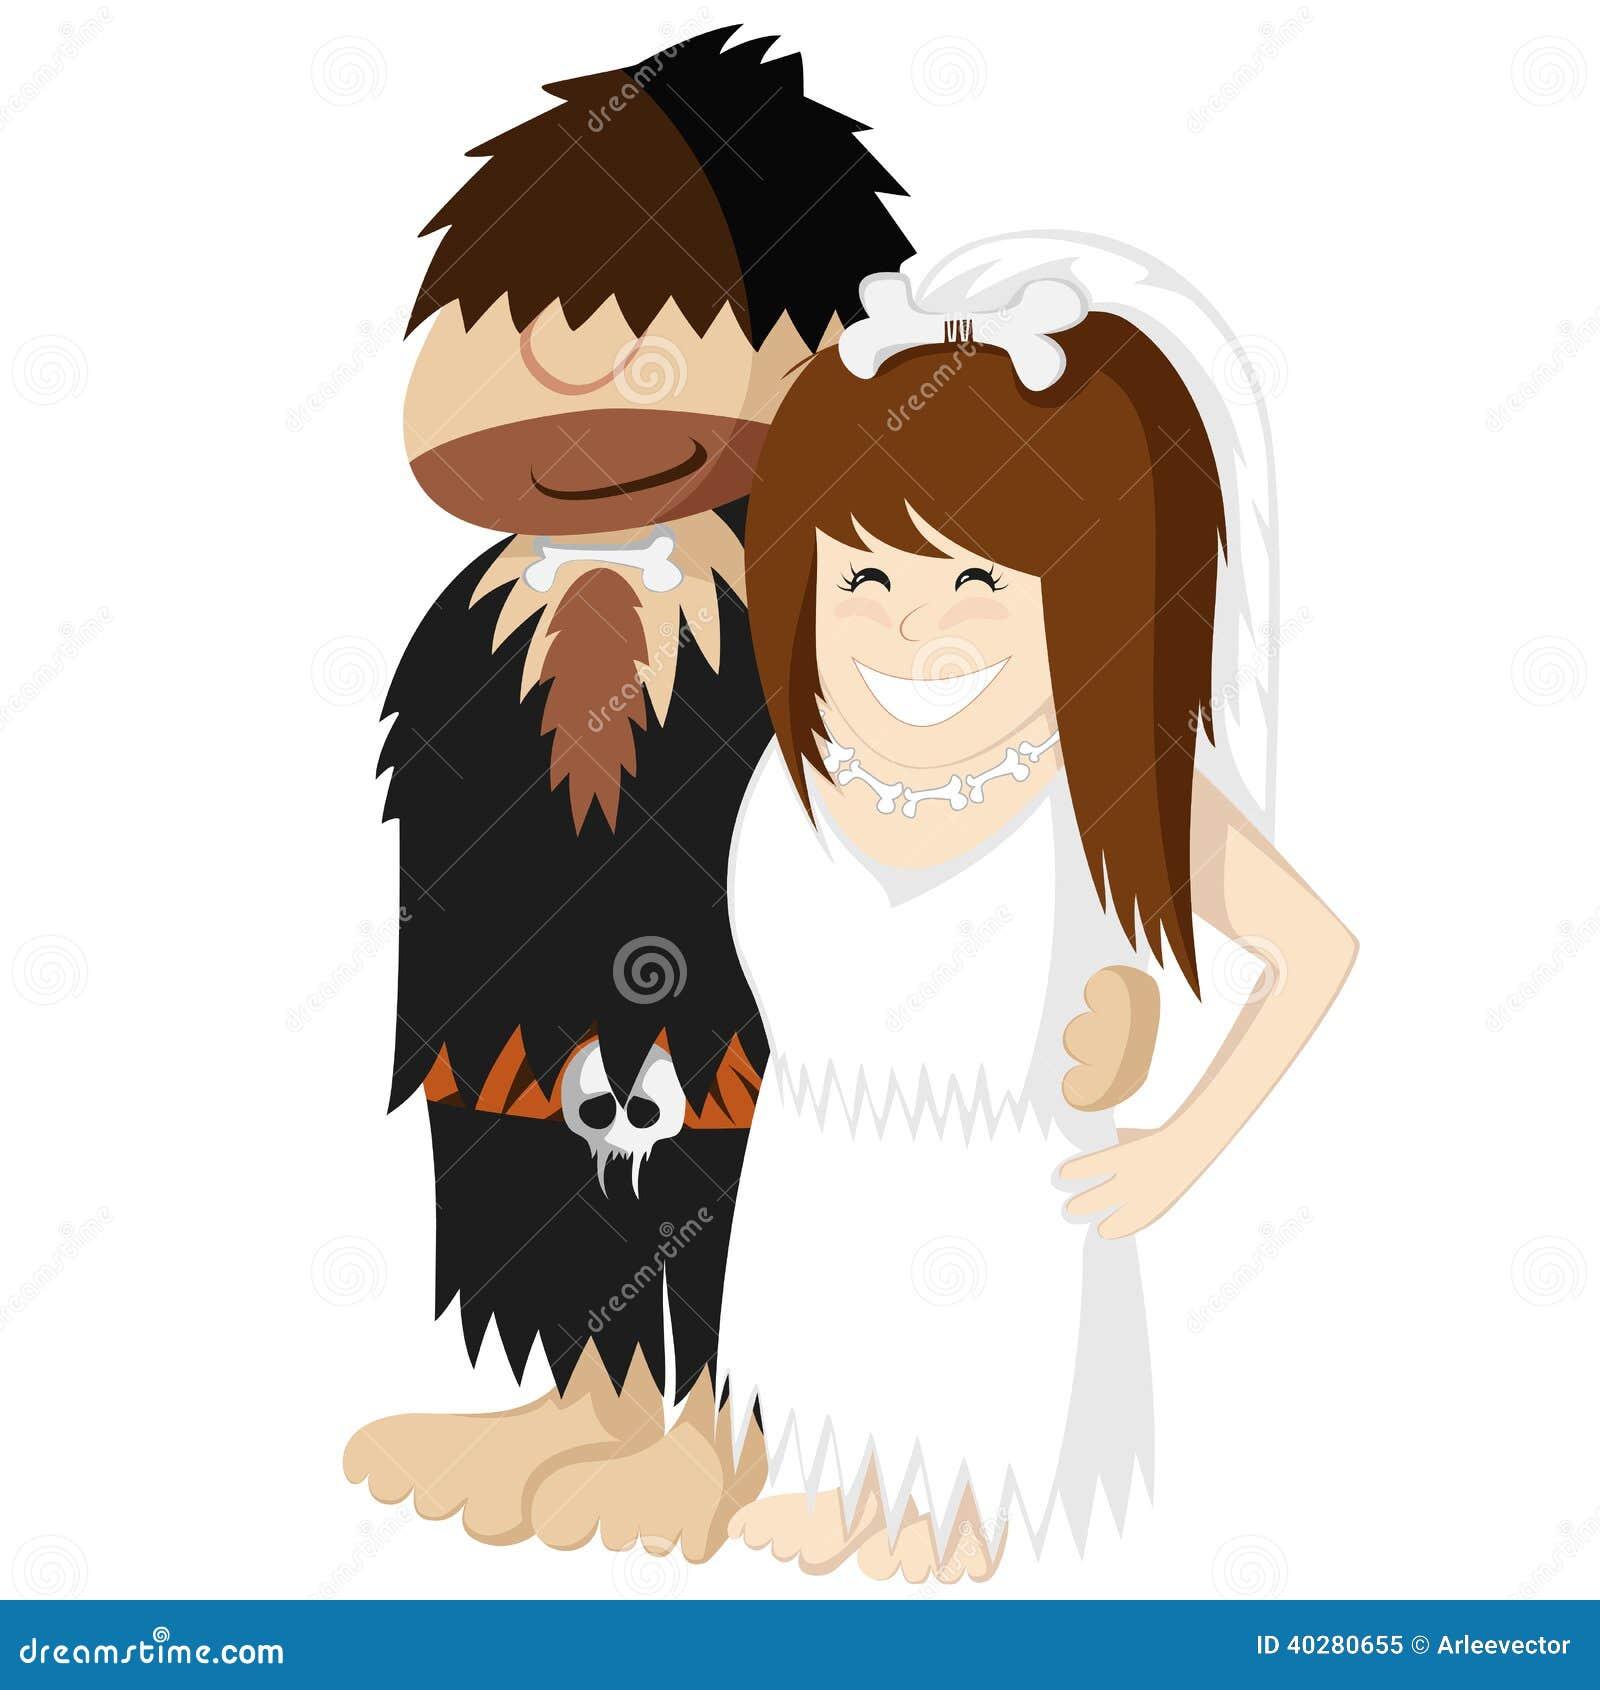 Caveman Hair Pulling : Paleo wedding stock vector image